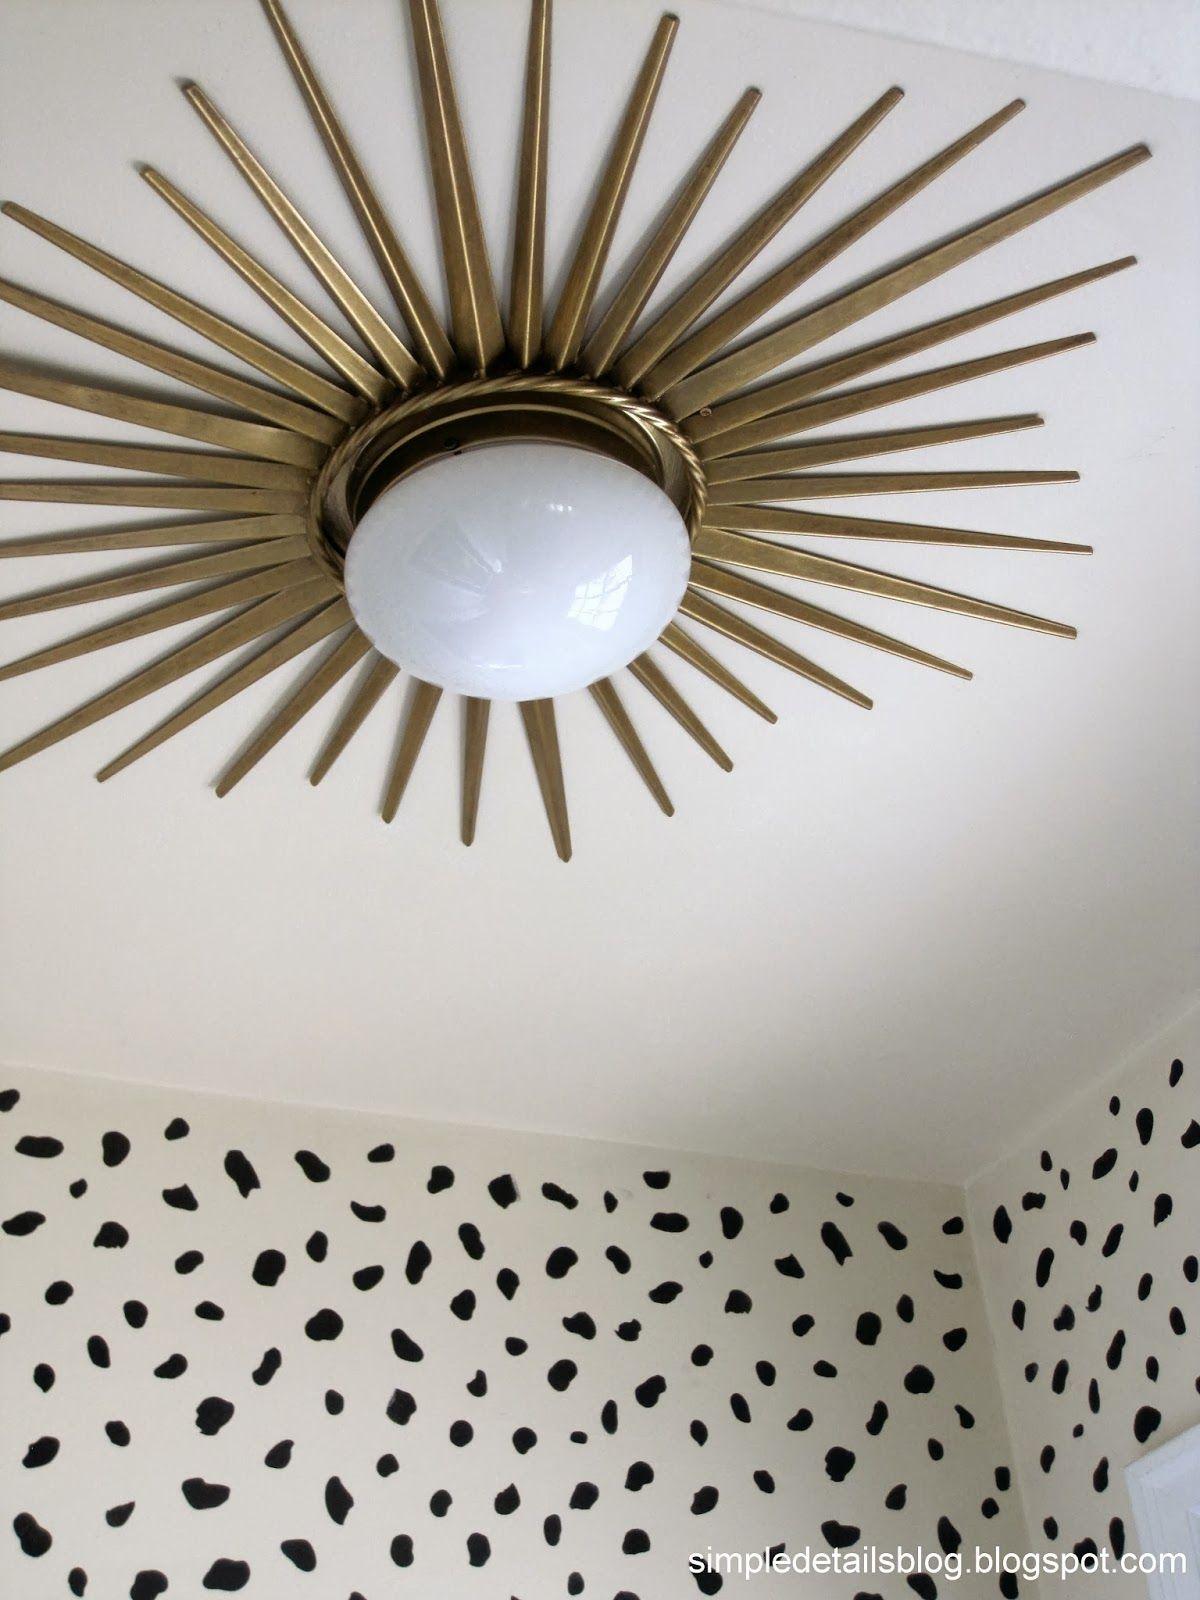 Diy Gold Sunburst Flush Mount Light Genius Home Improvement Projects Decor Home Diy